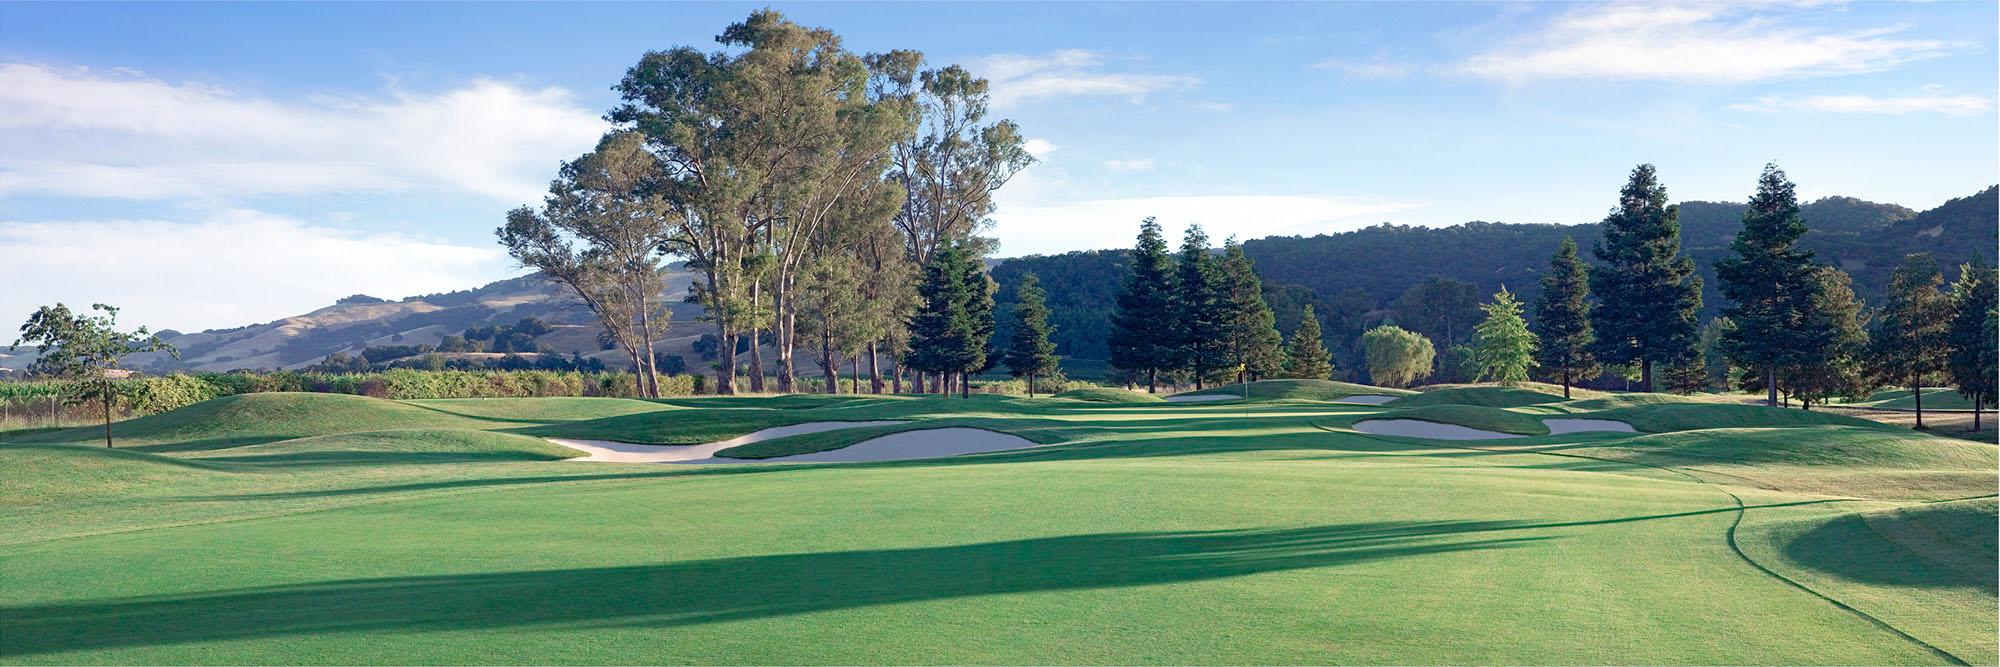 Golf Course Image - Sonoma No. 2